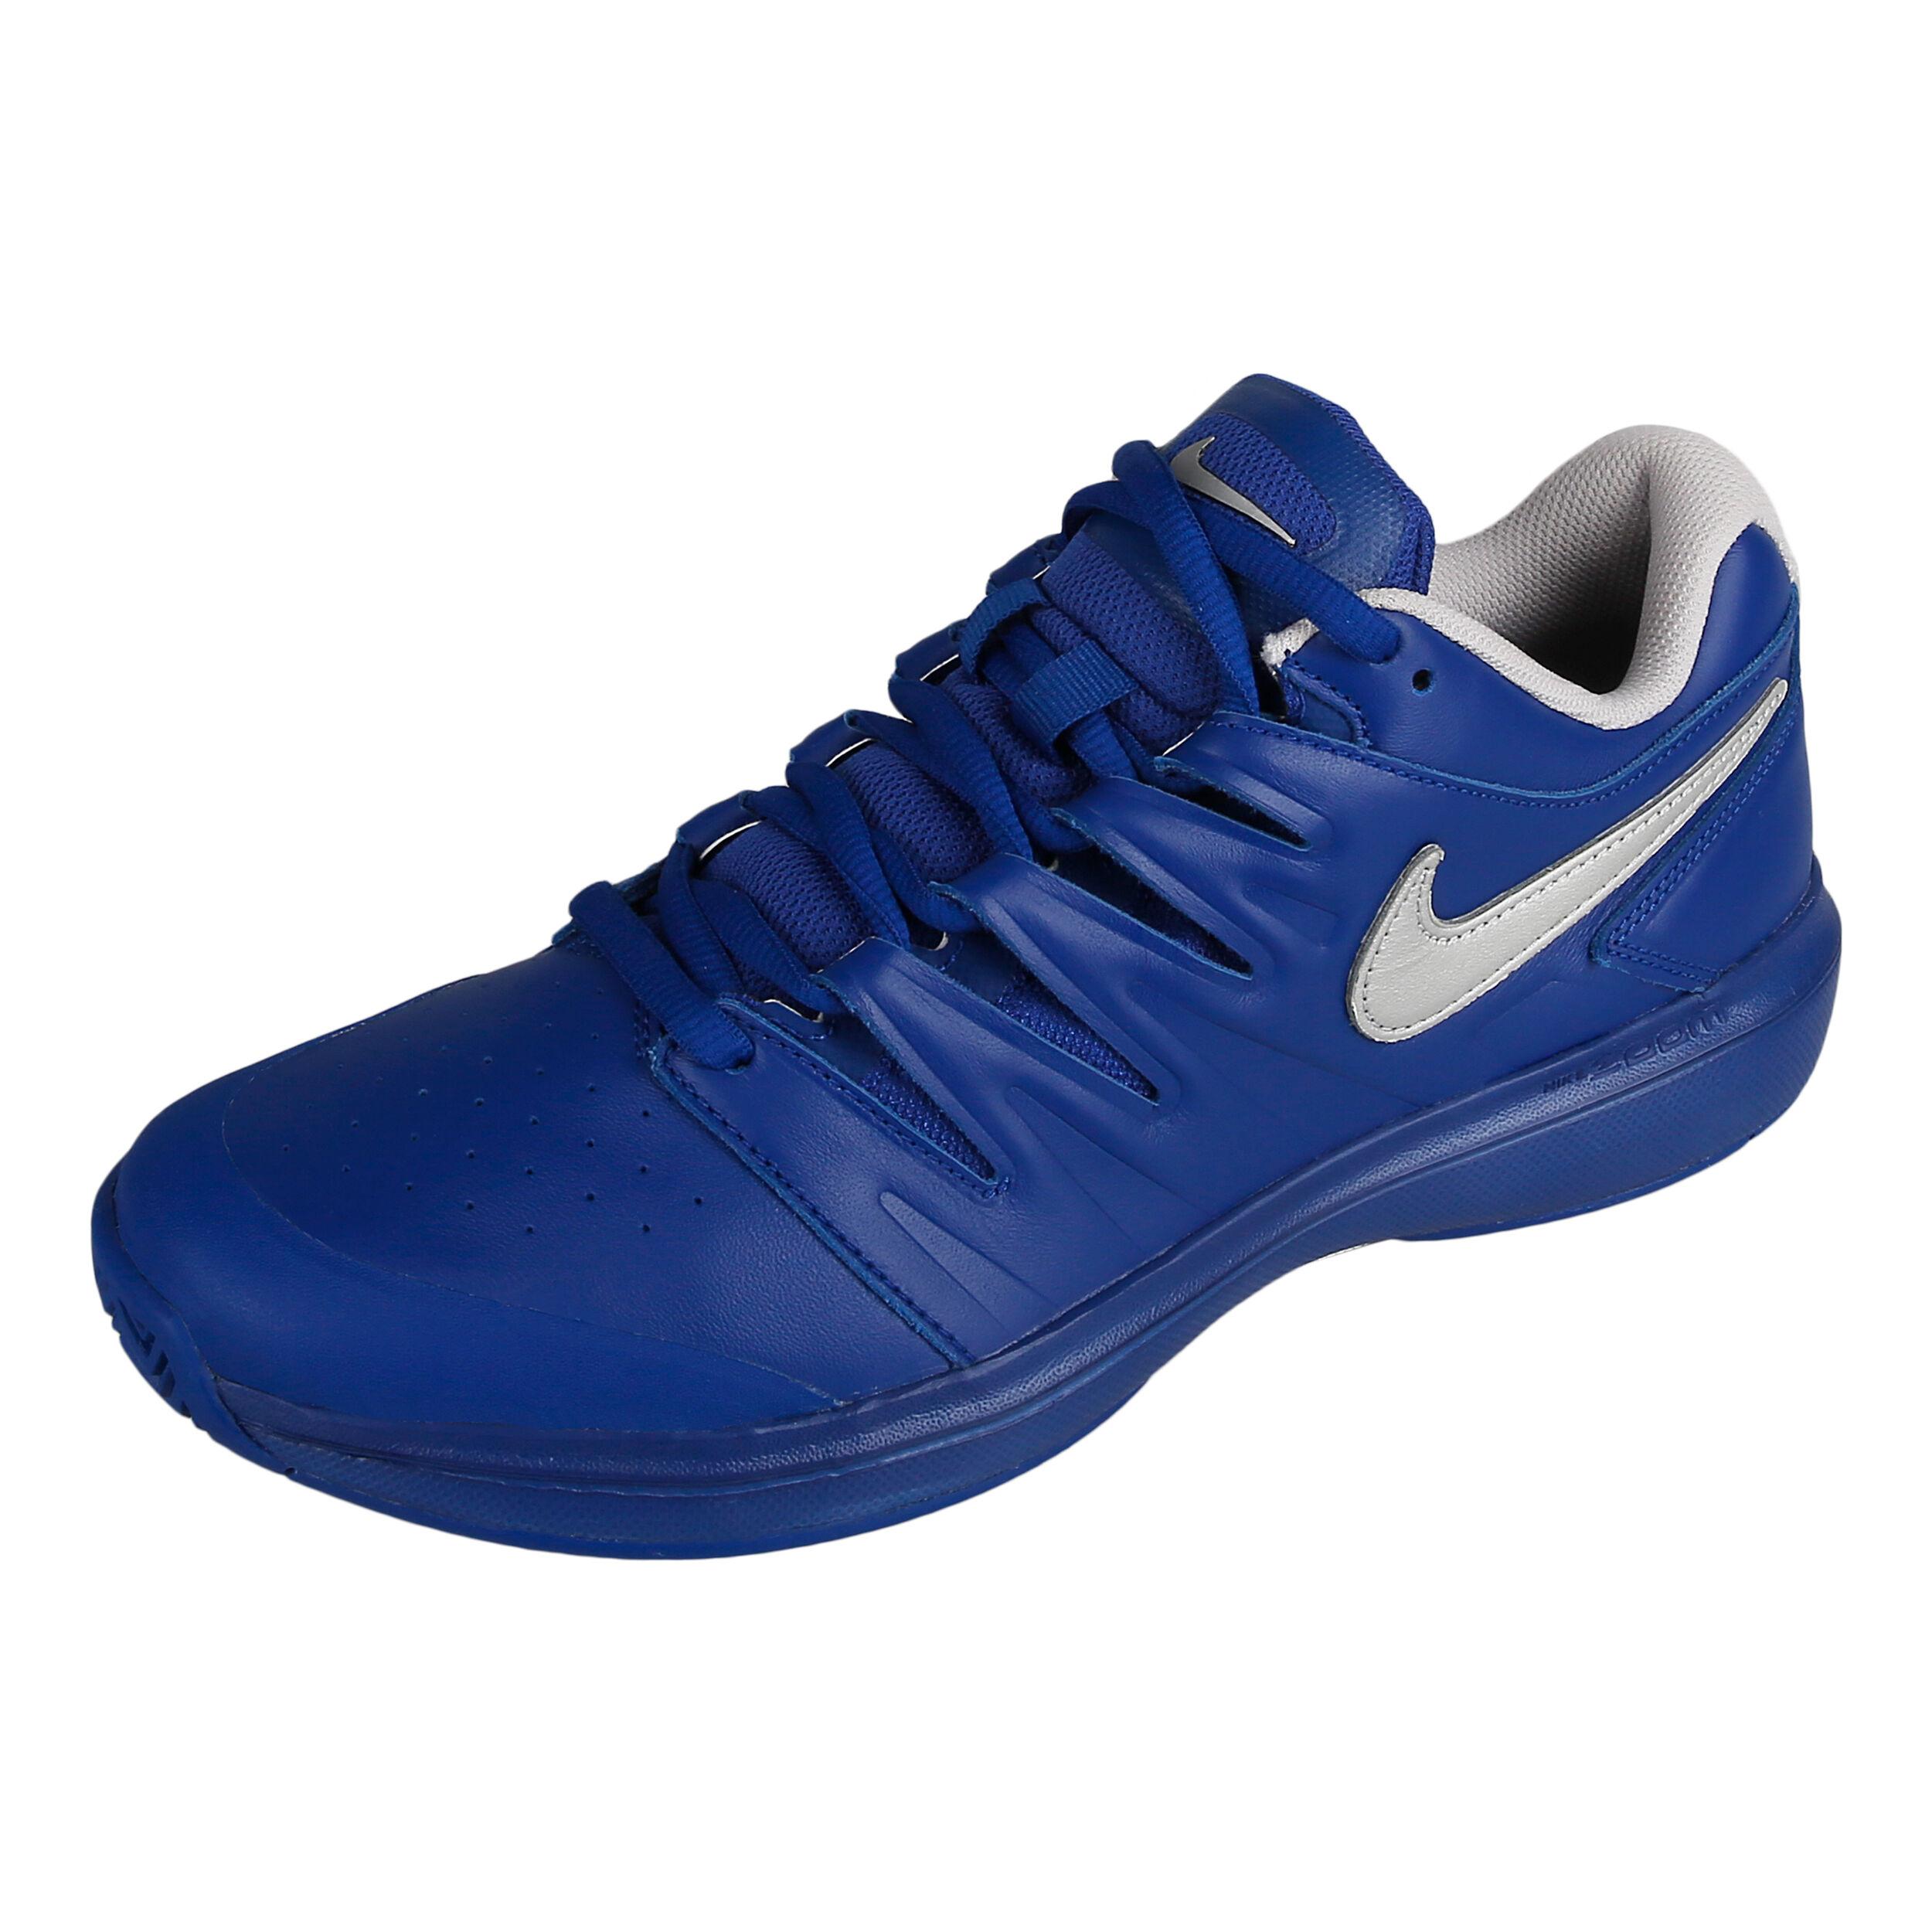 Nike Air Zoom Prestige Allcourtschuh Herren Hellgrau, Blau